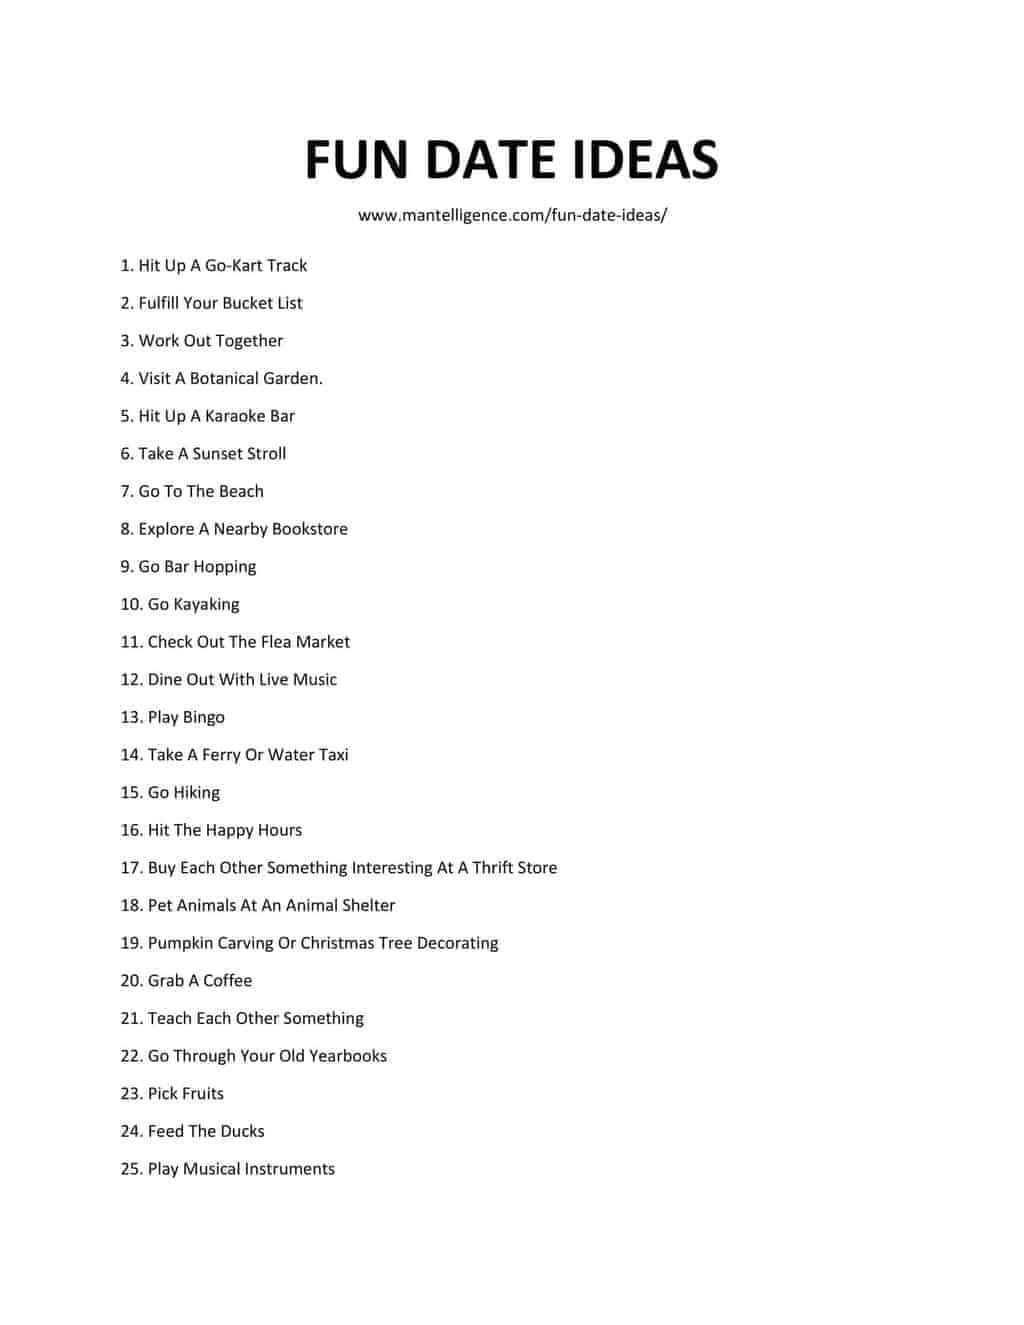 list of fun date ideas-1